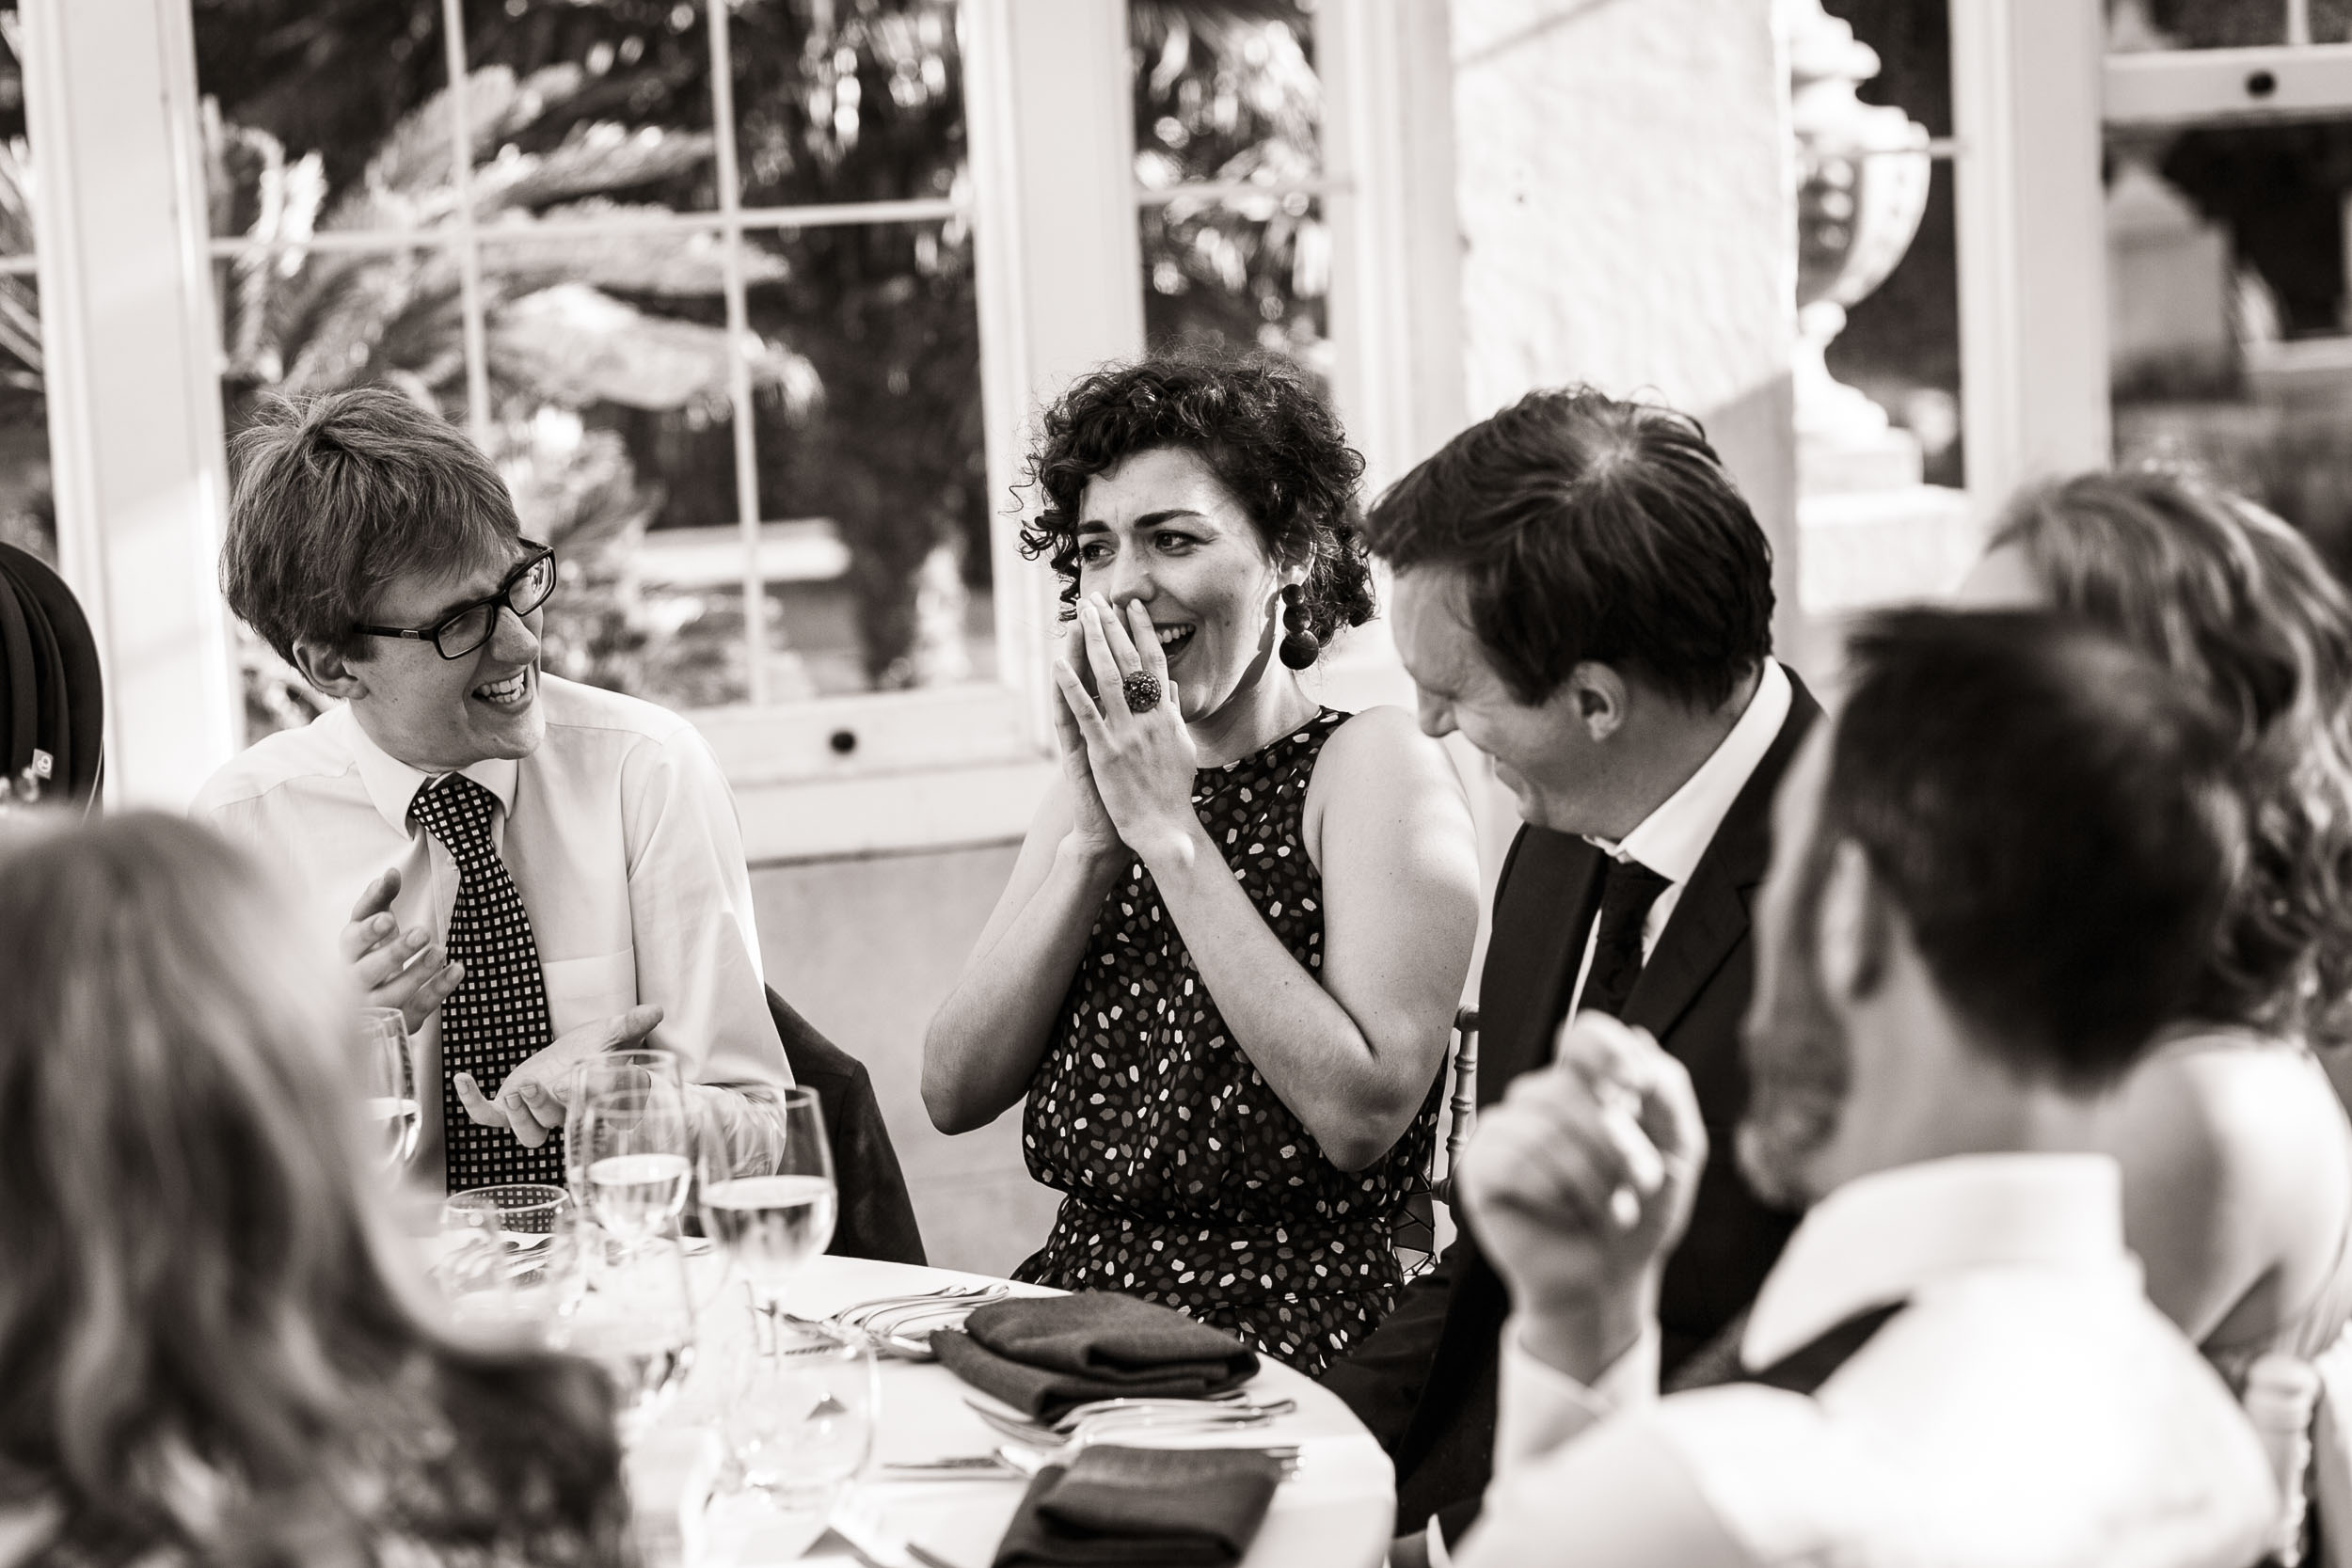 syon-house-wedding-photographer-london 127.jpg